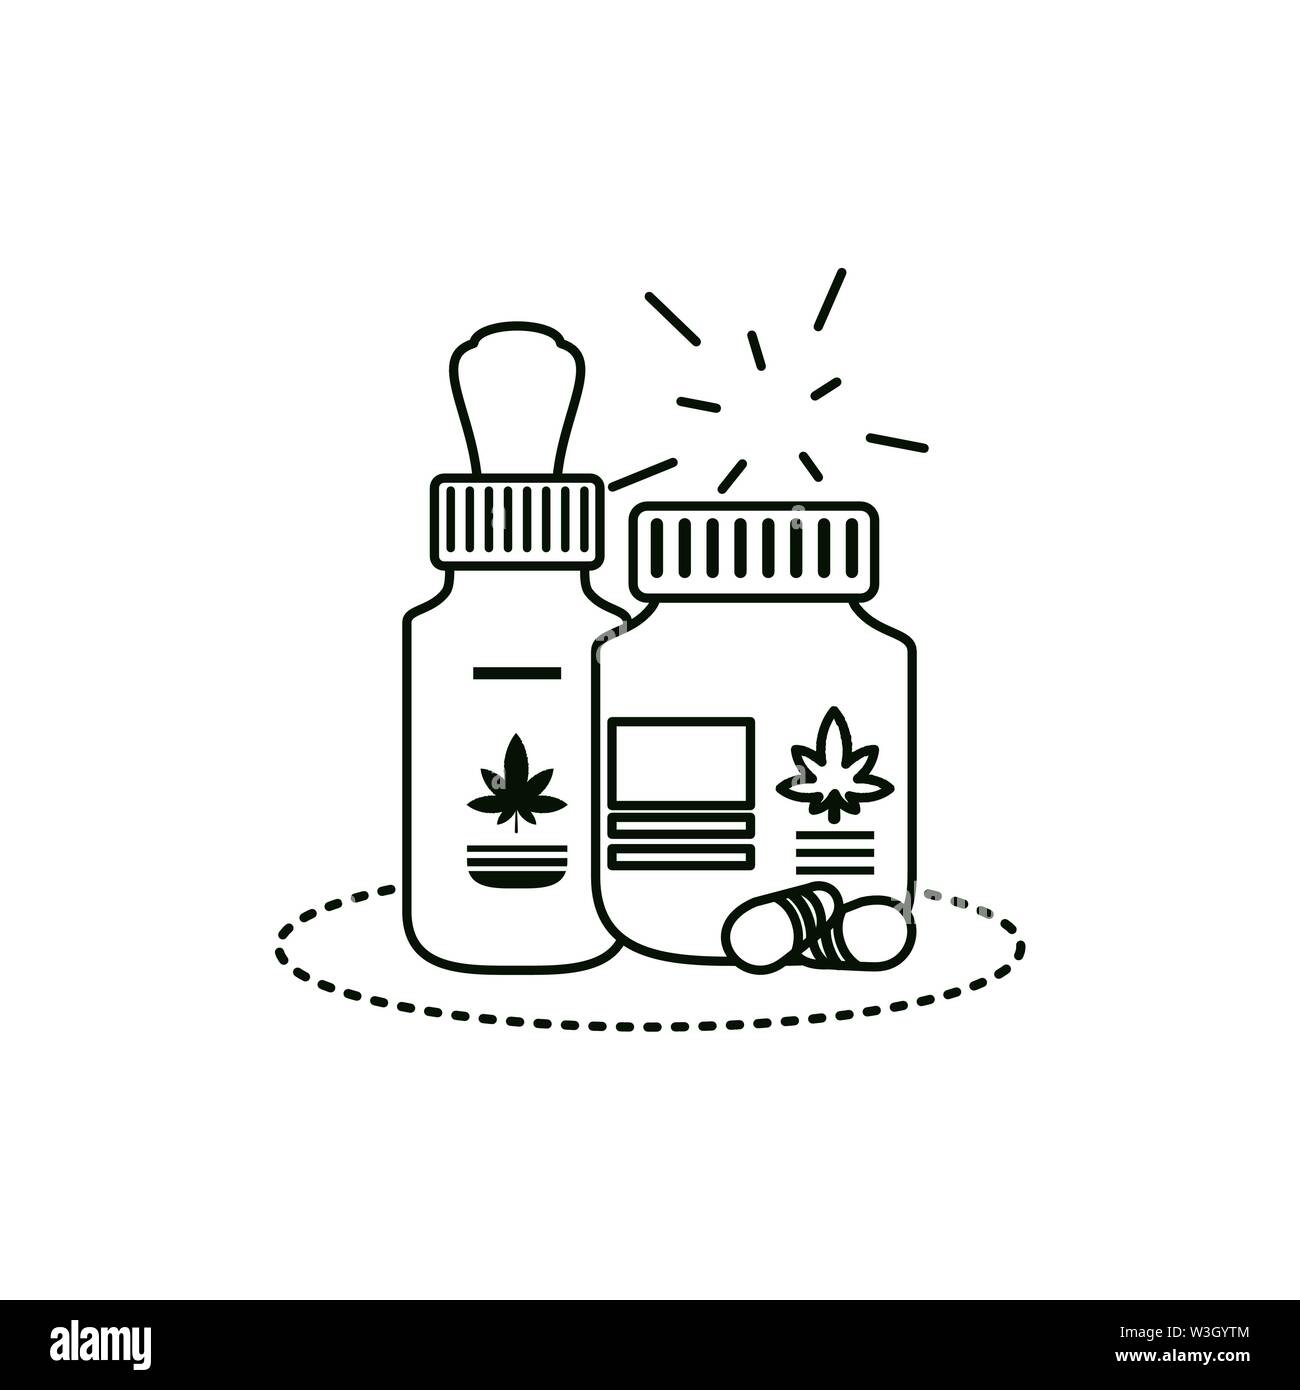 Cannabis Flasche mit Tropfer Symbol Vektor illustration Design Stockbild